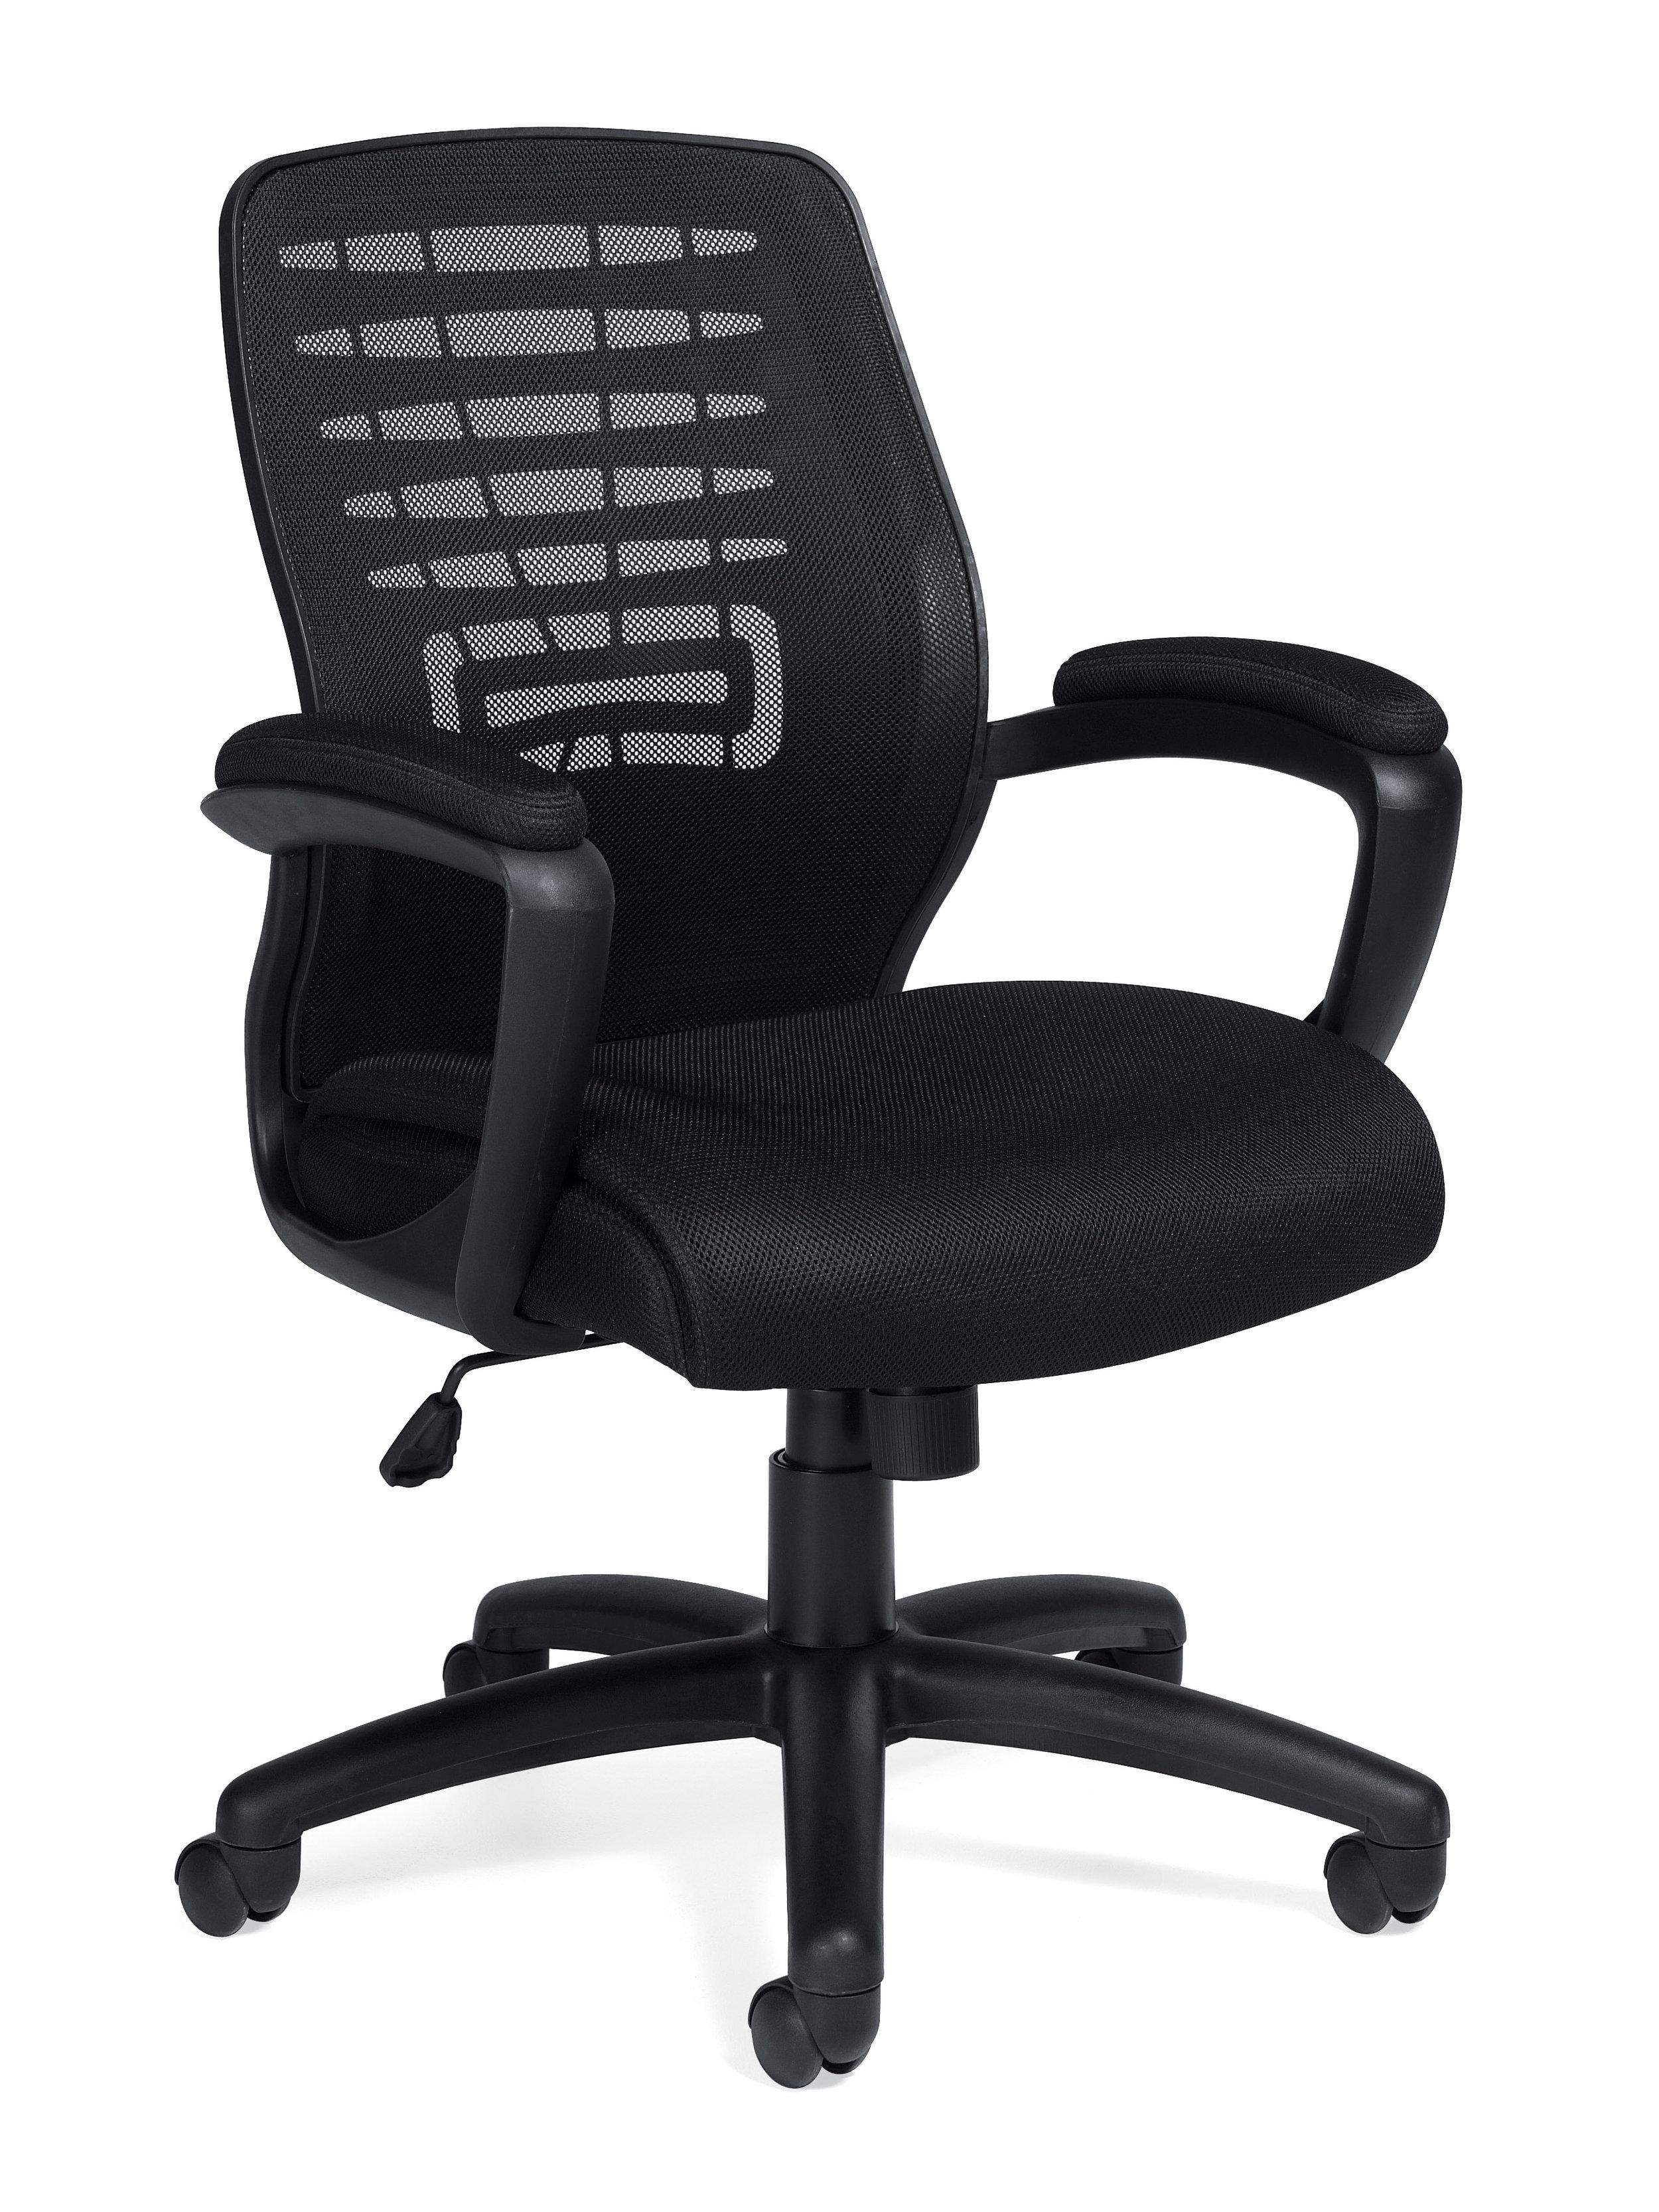 OTG11750B Mesh Back Manager's Chair